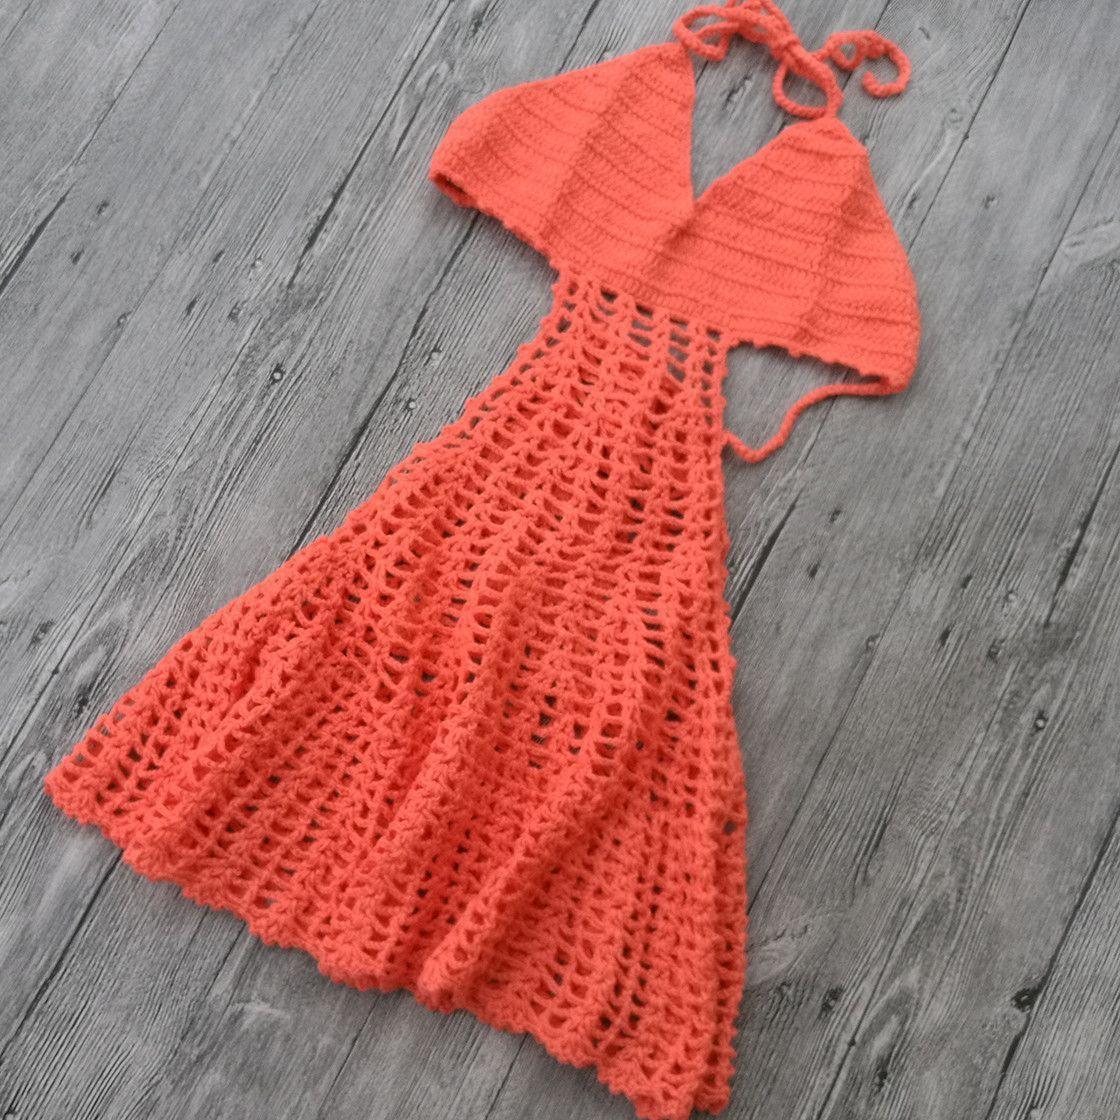 2017 women bikini crochet sexy red black openwork cover ups knit 2017 women bikini crochet sexy red black openwork cover ups knit backless halter bathing suit swimsuit bankloansurffo Images